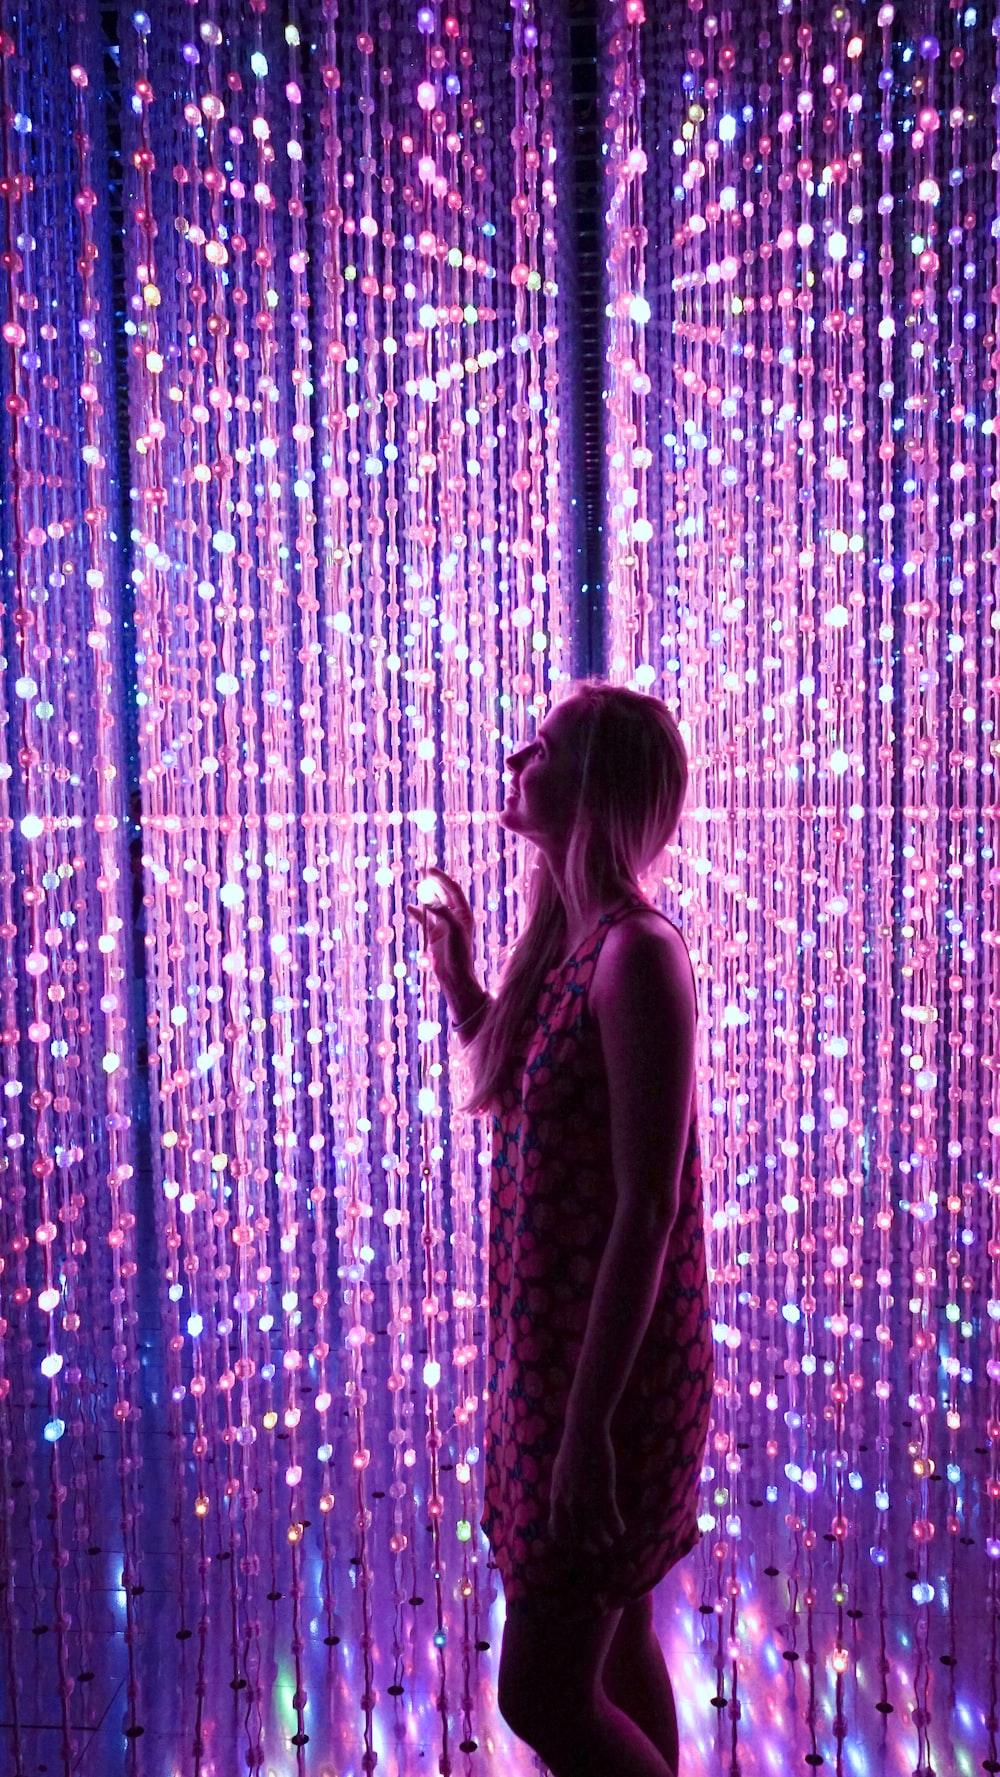 woman standing sting lights